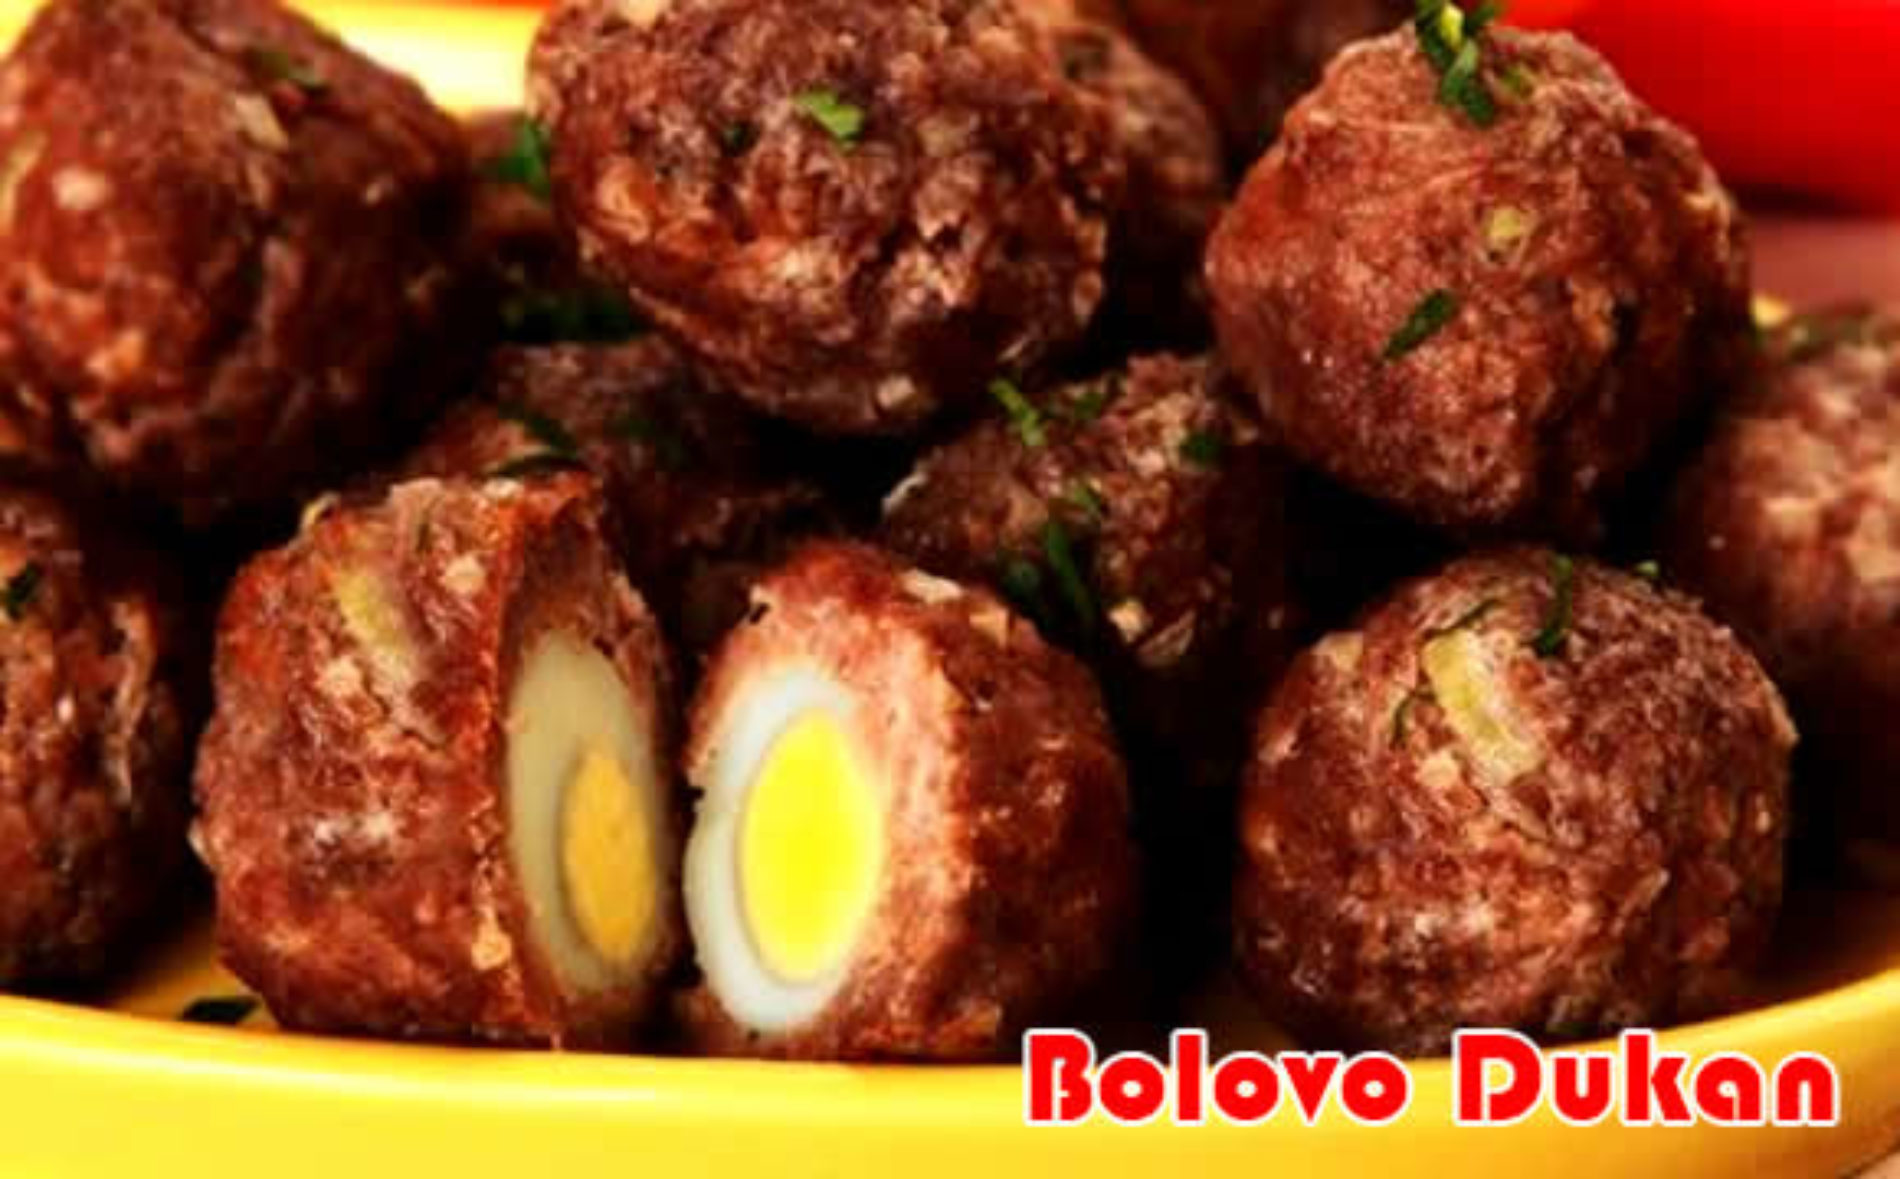 Bolovo – Dieta Dukan